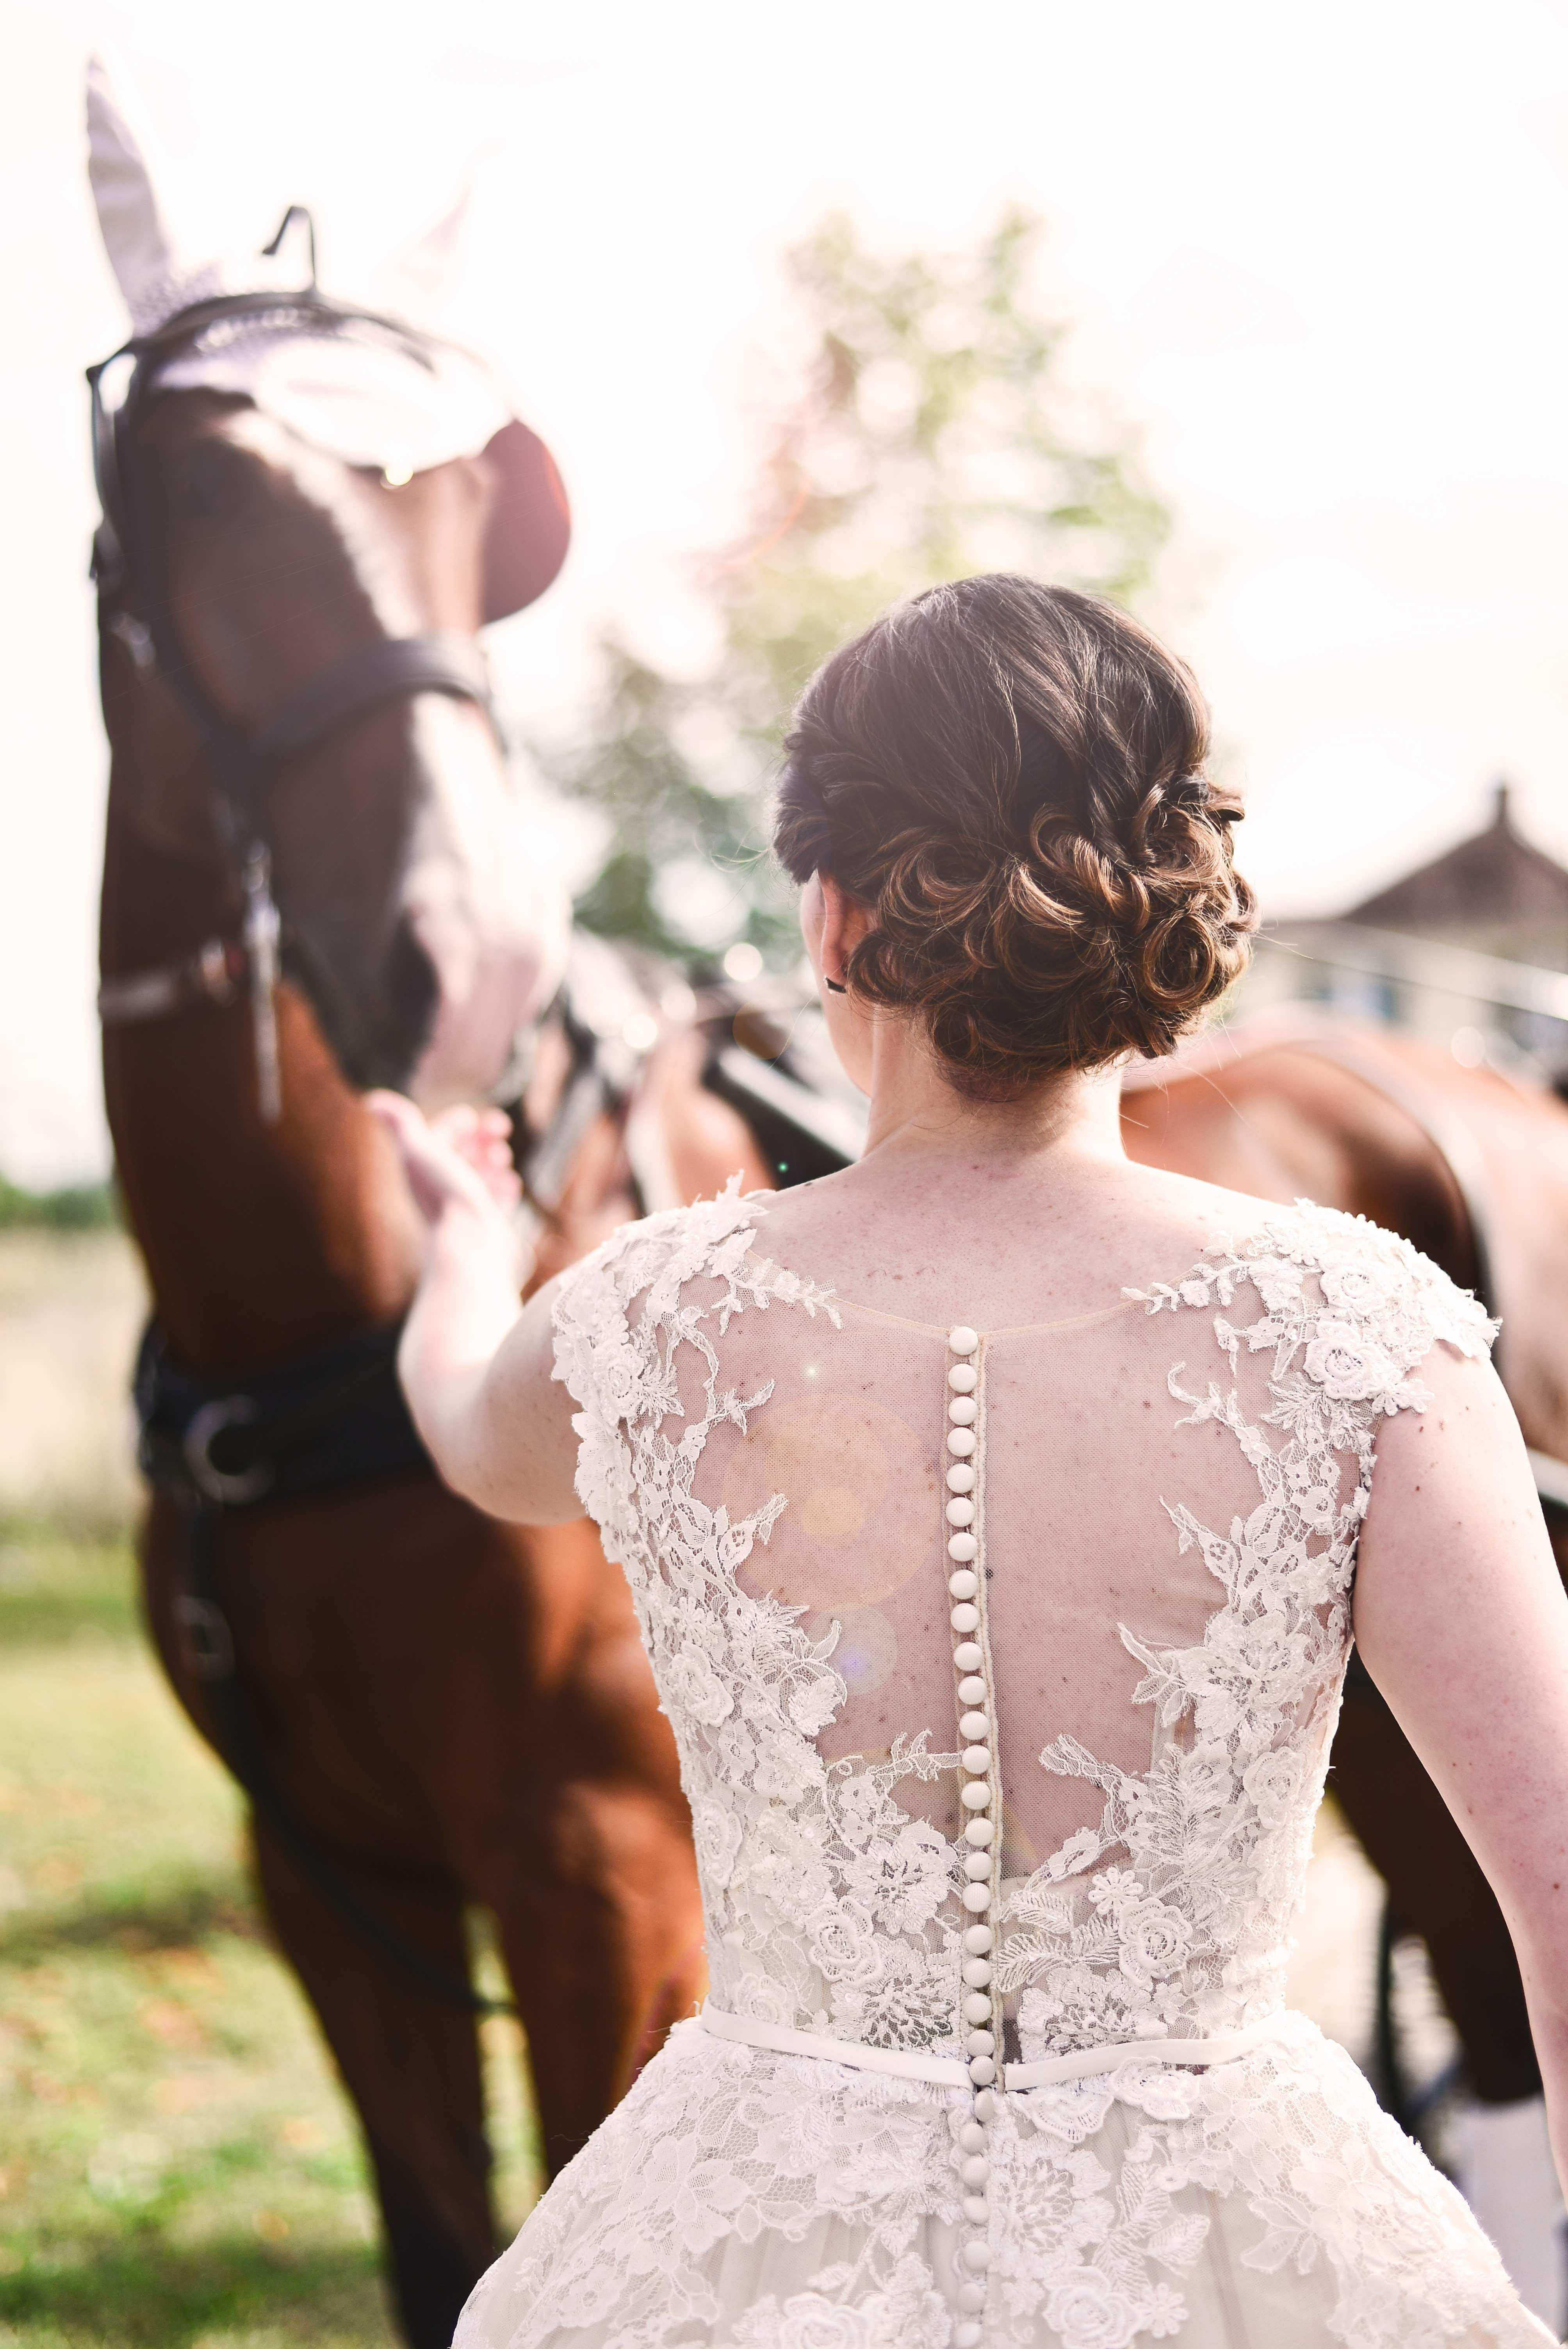 HochzeitfrisurenbxqCNLSolpIqy